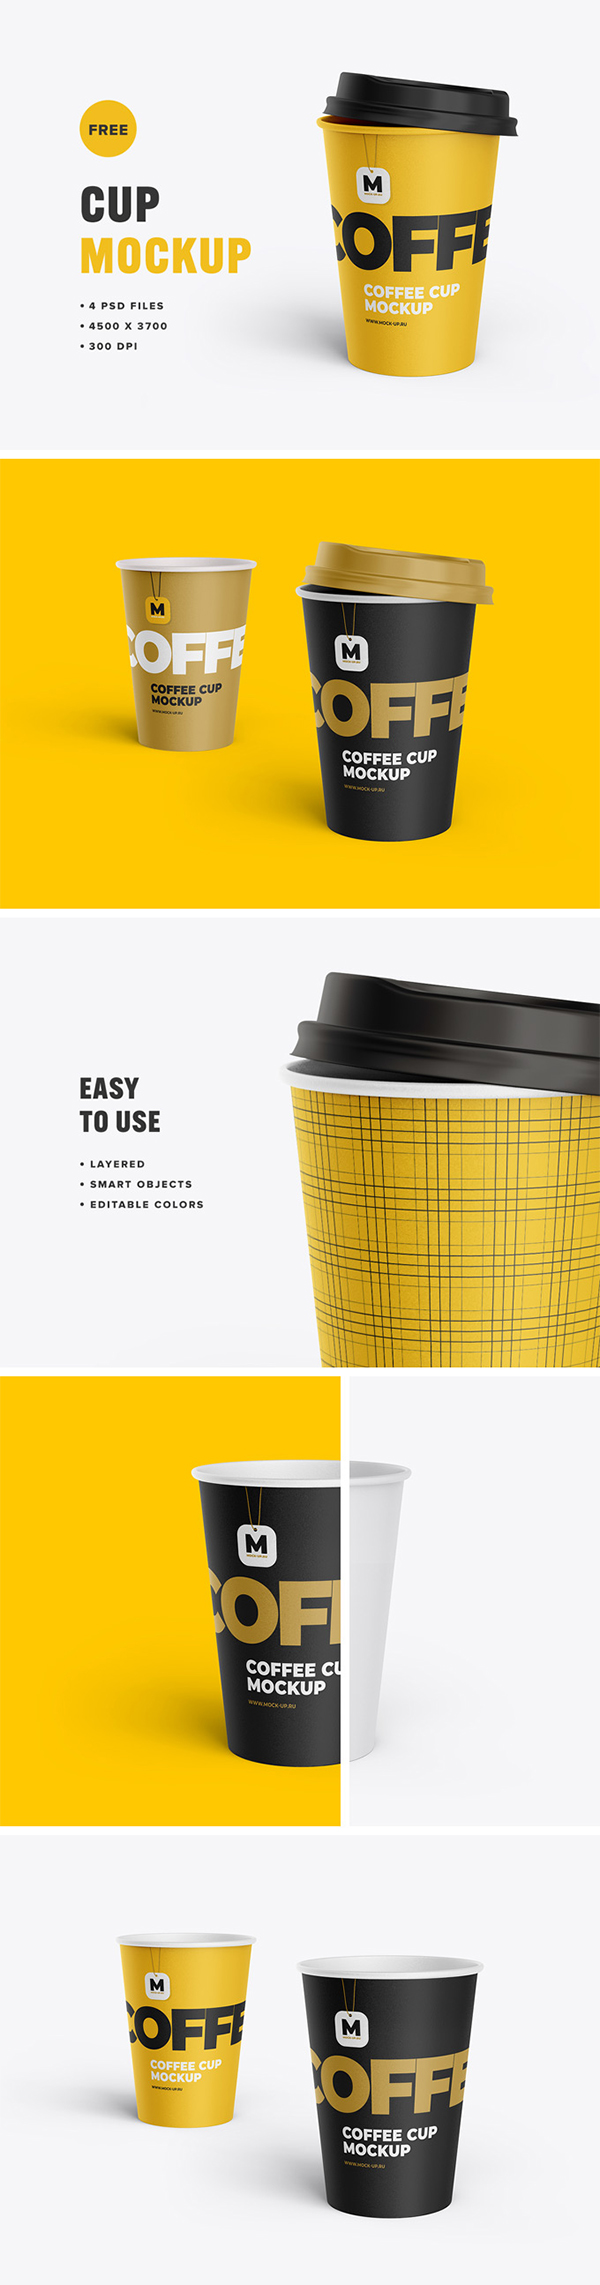 Free Tea and Coffee Cup Mockup